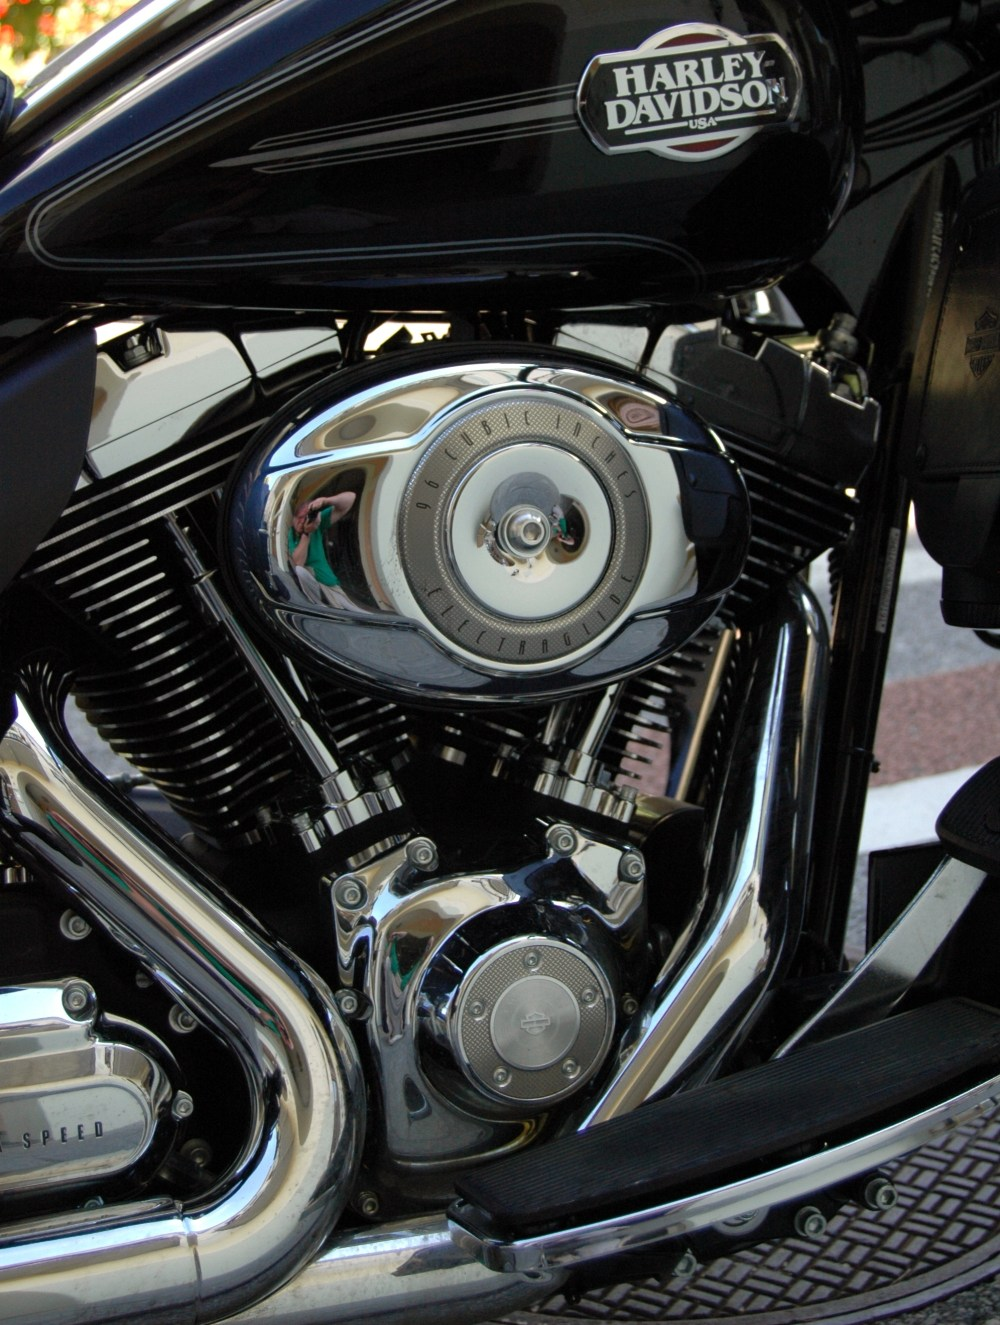 motorcycle-motor-chrome-vehicle-159443.jpg